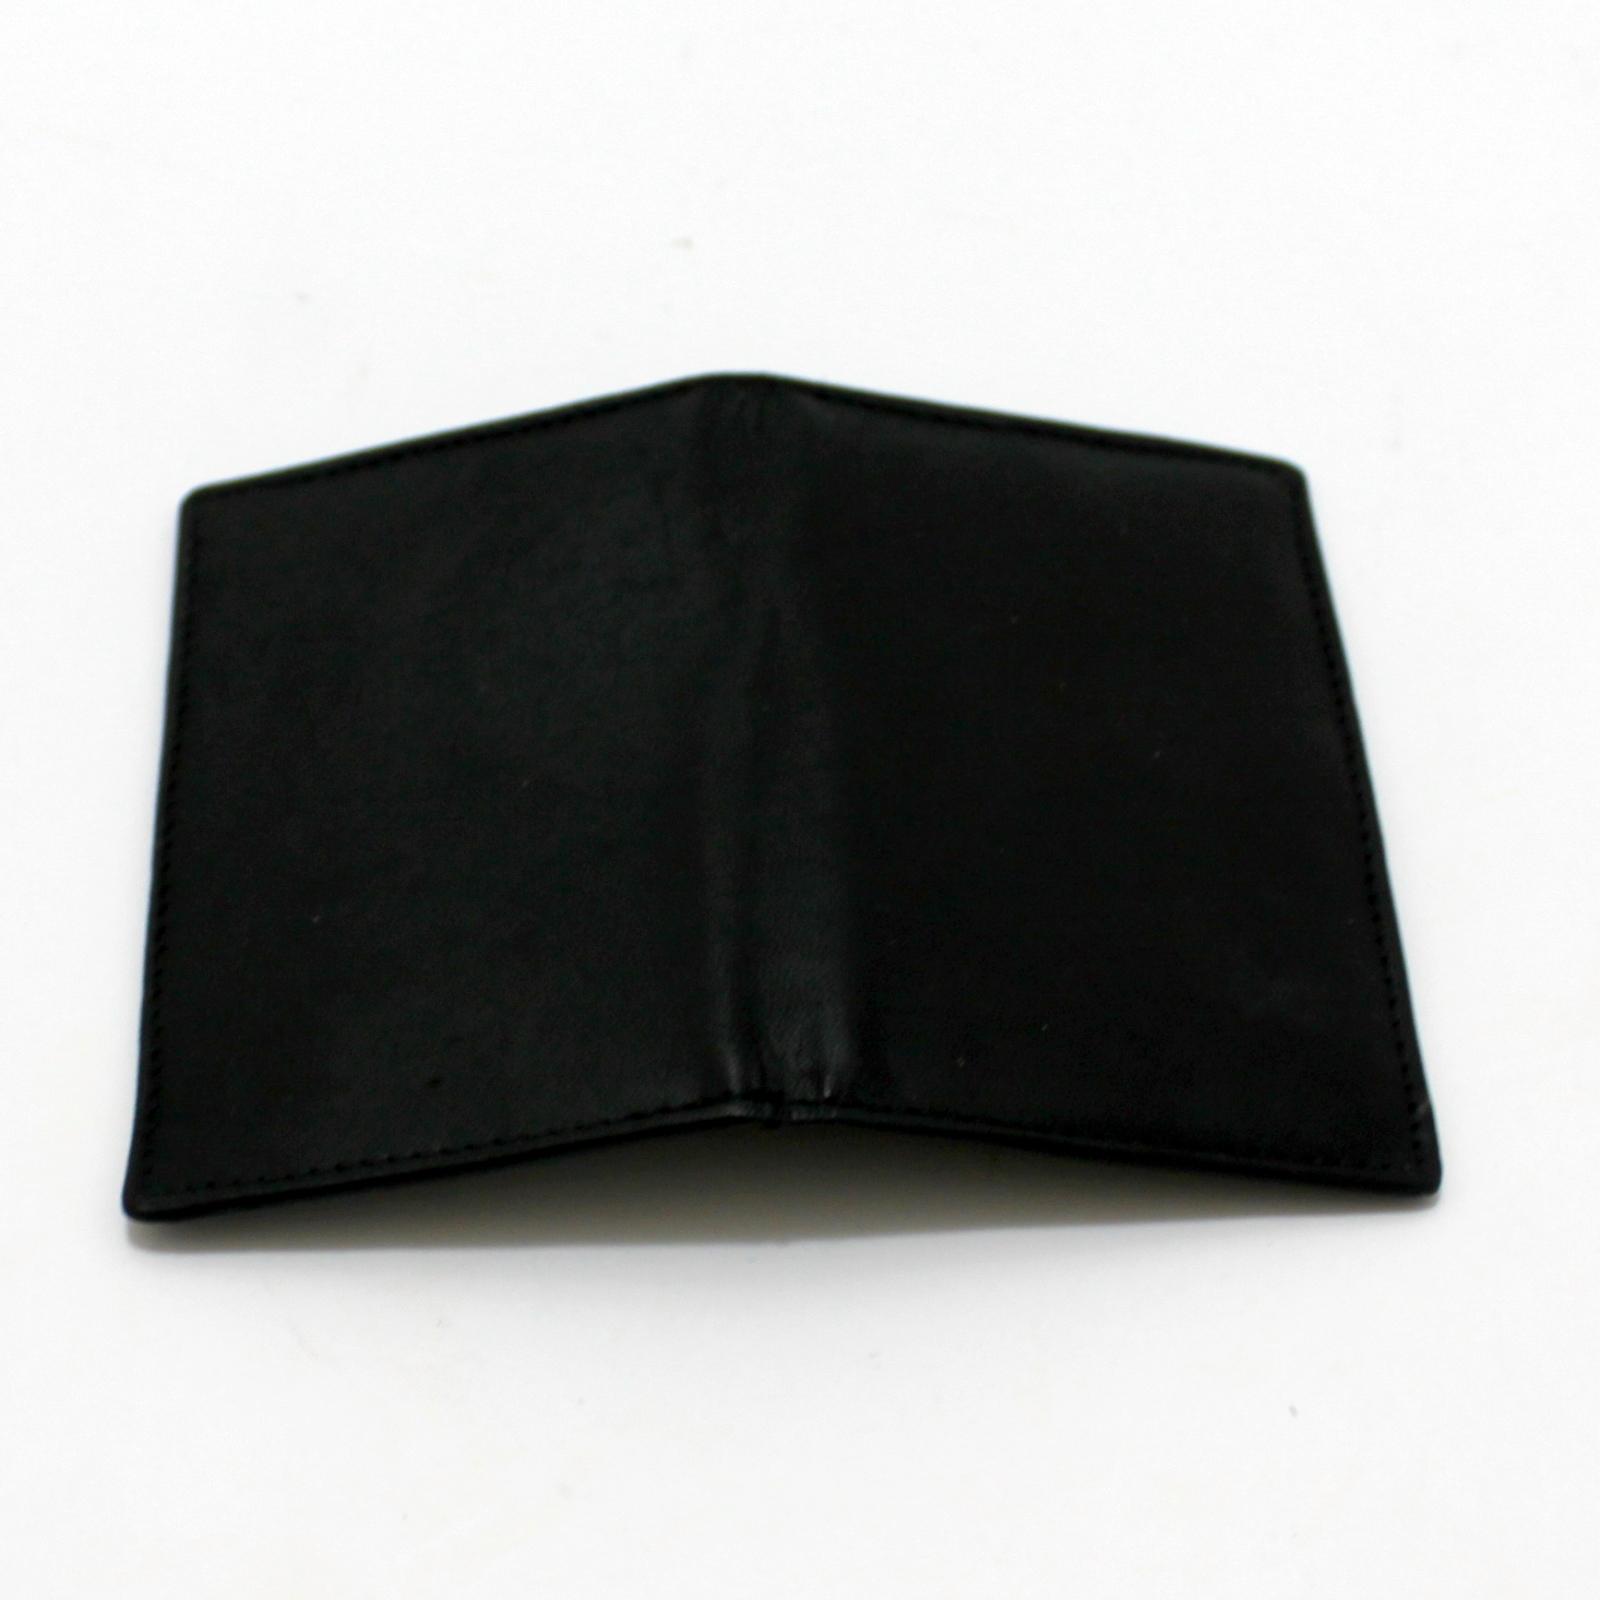 Inversion Wallet - Leather by Bob Solari Magic